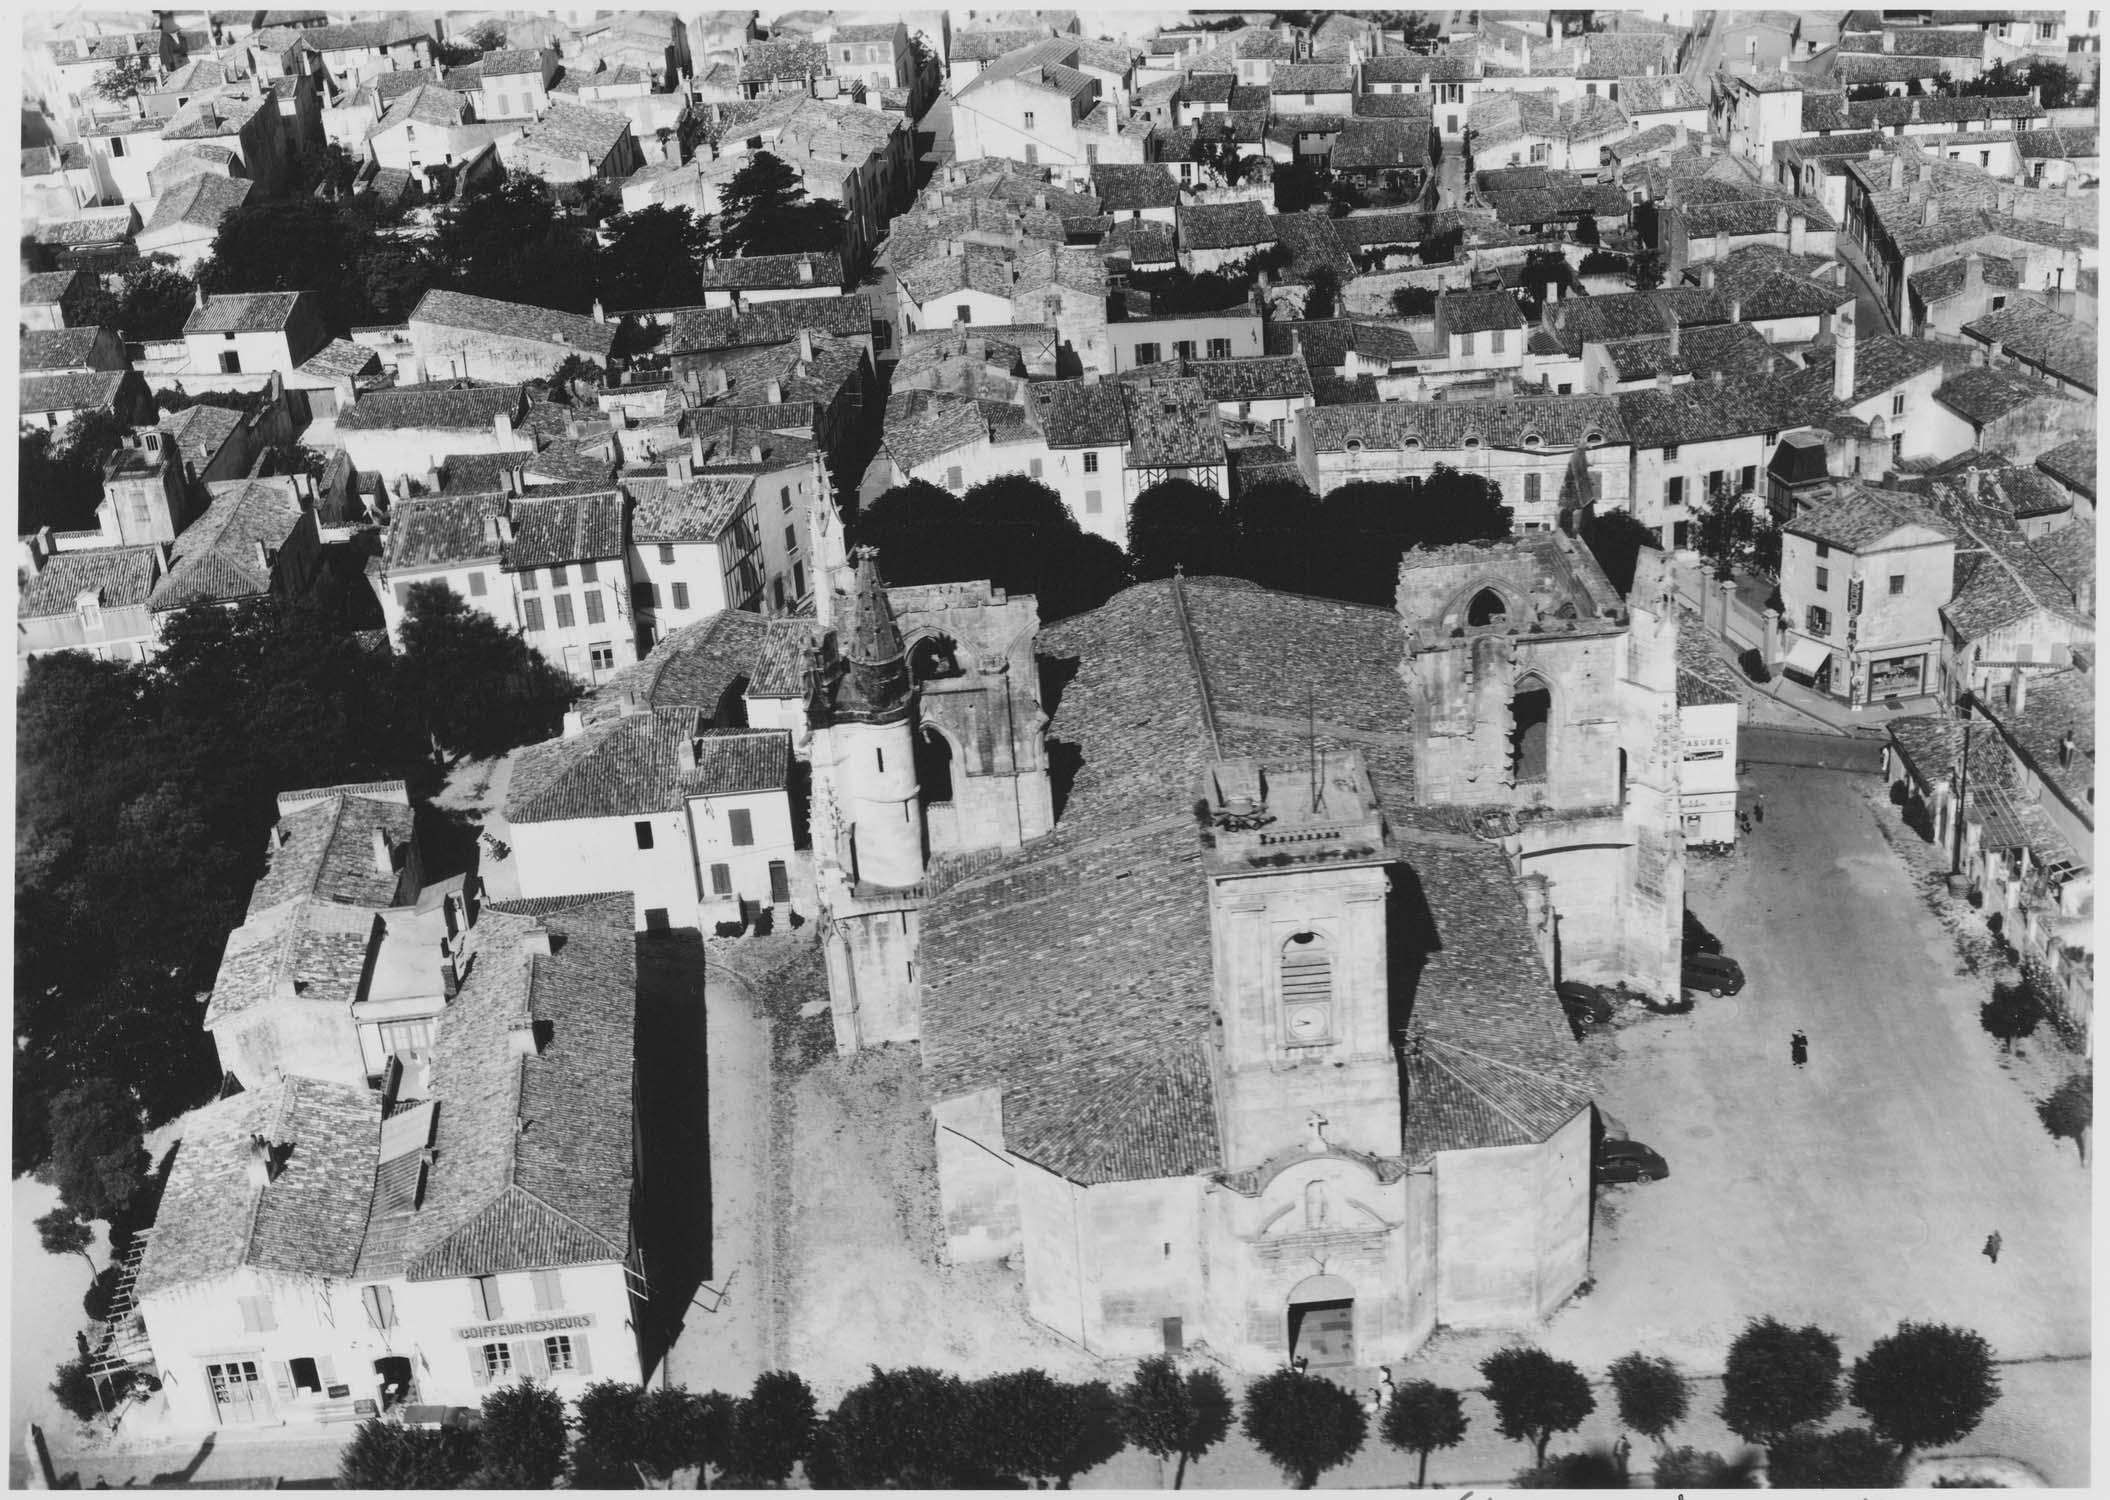 Eglise Saint-Martin dite Le Grand Fort